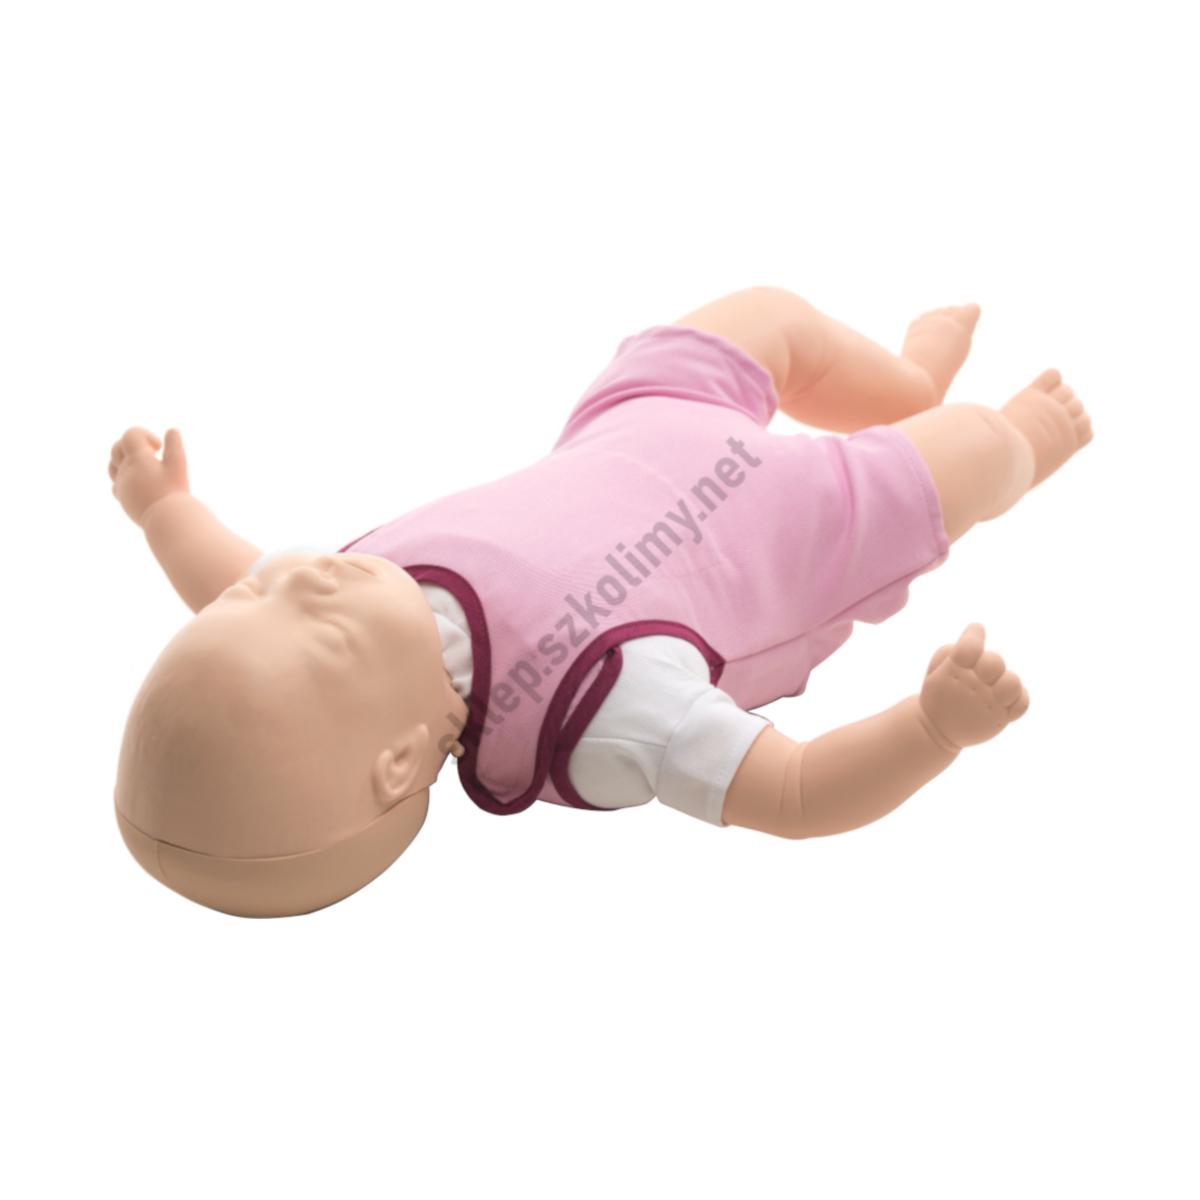 Laerdal Little Baby